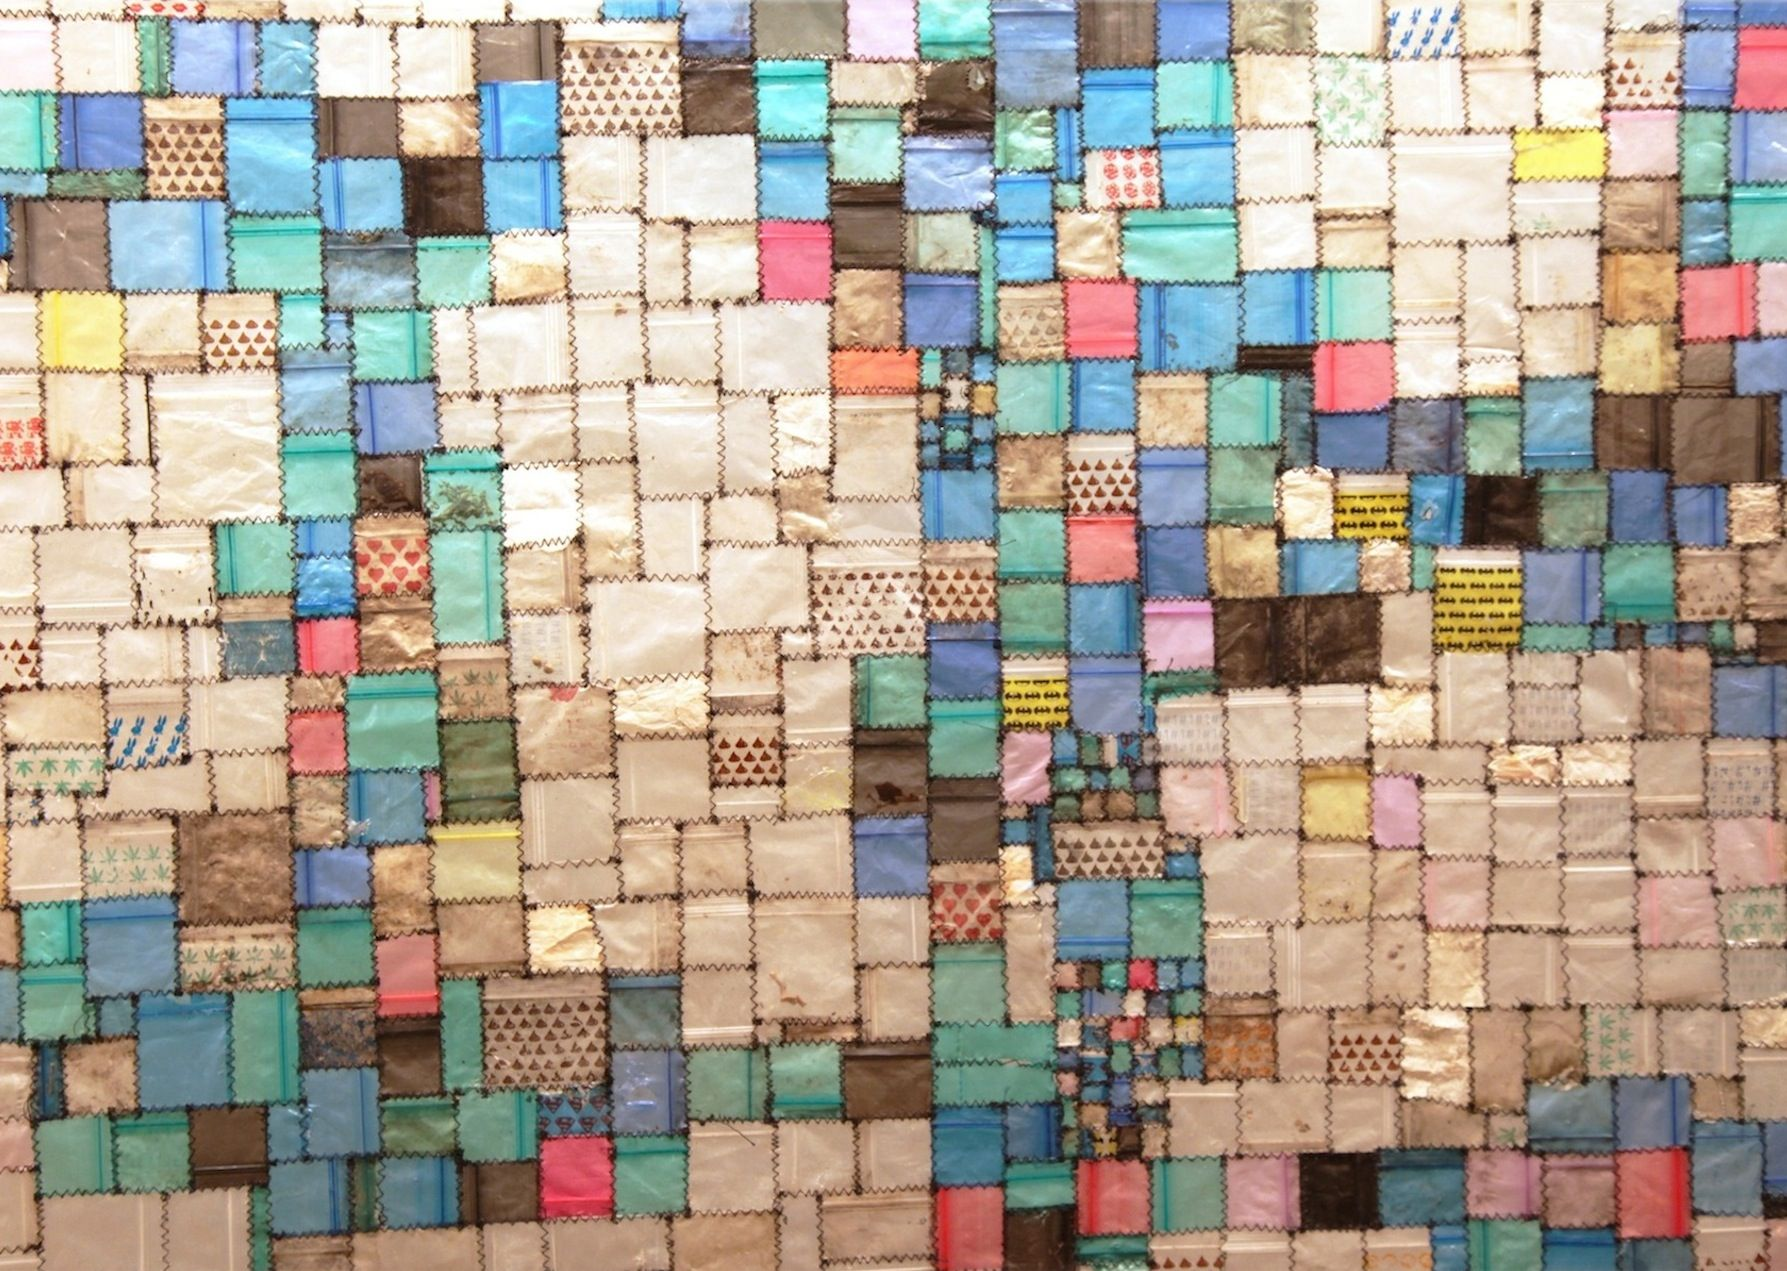 Tom Fruin. Treasure Map: R.V. Ingersoll. Found drug bags, thread.